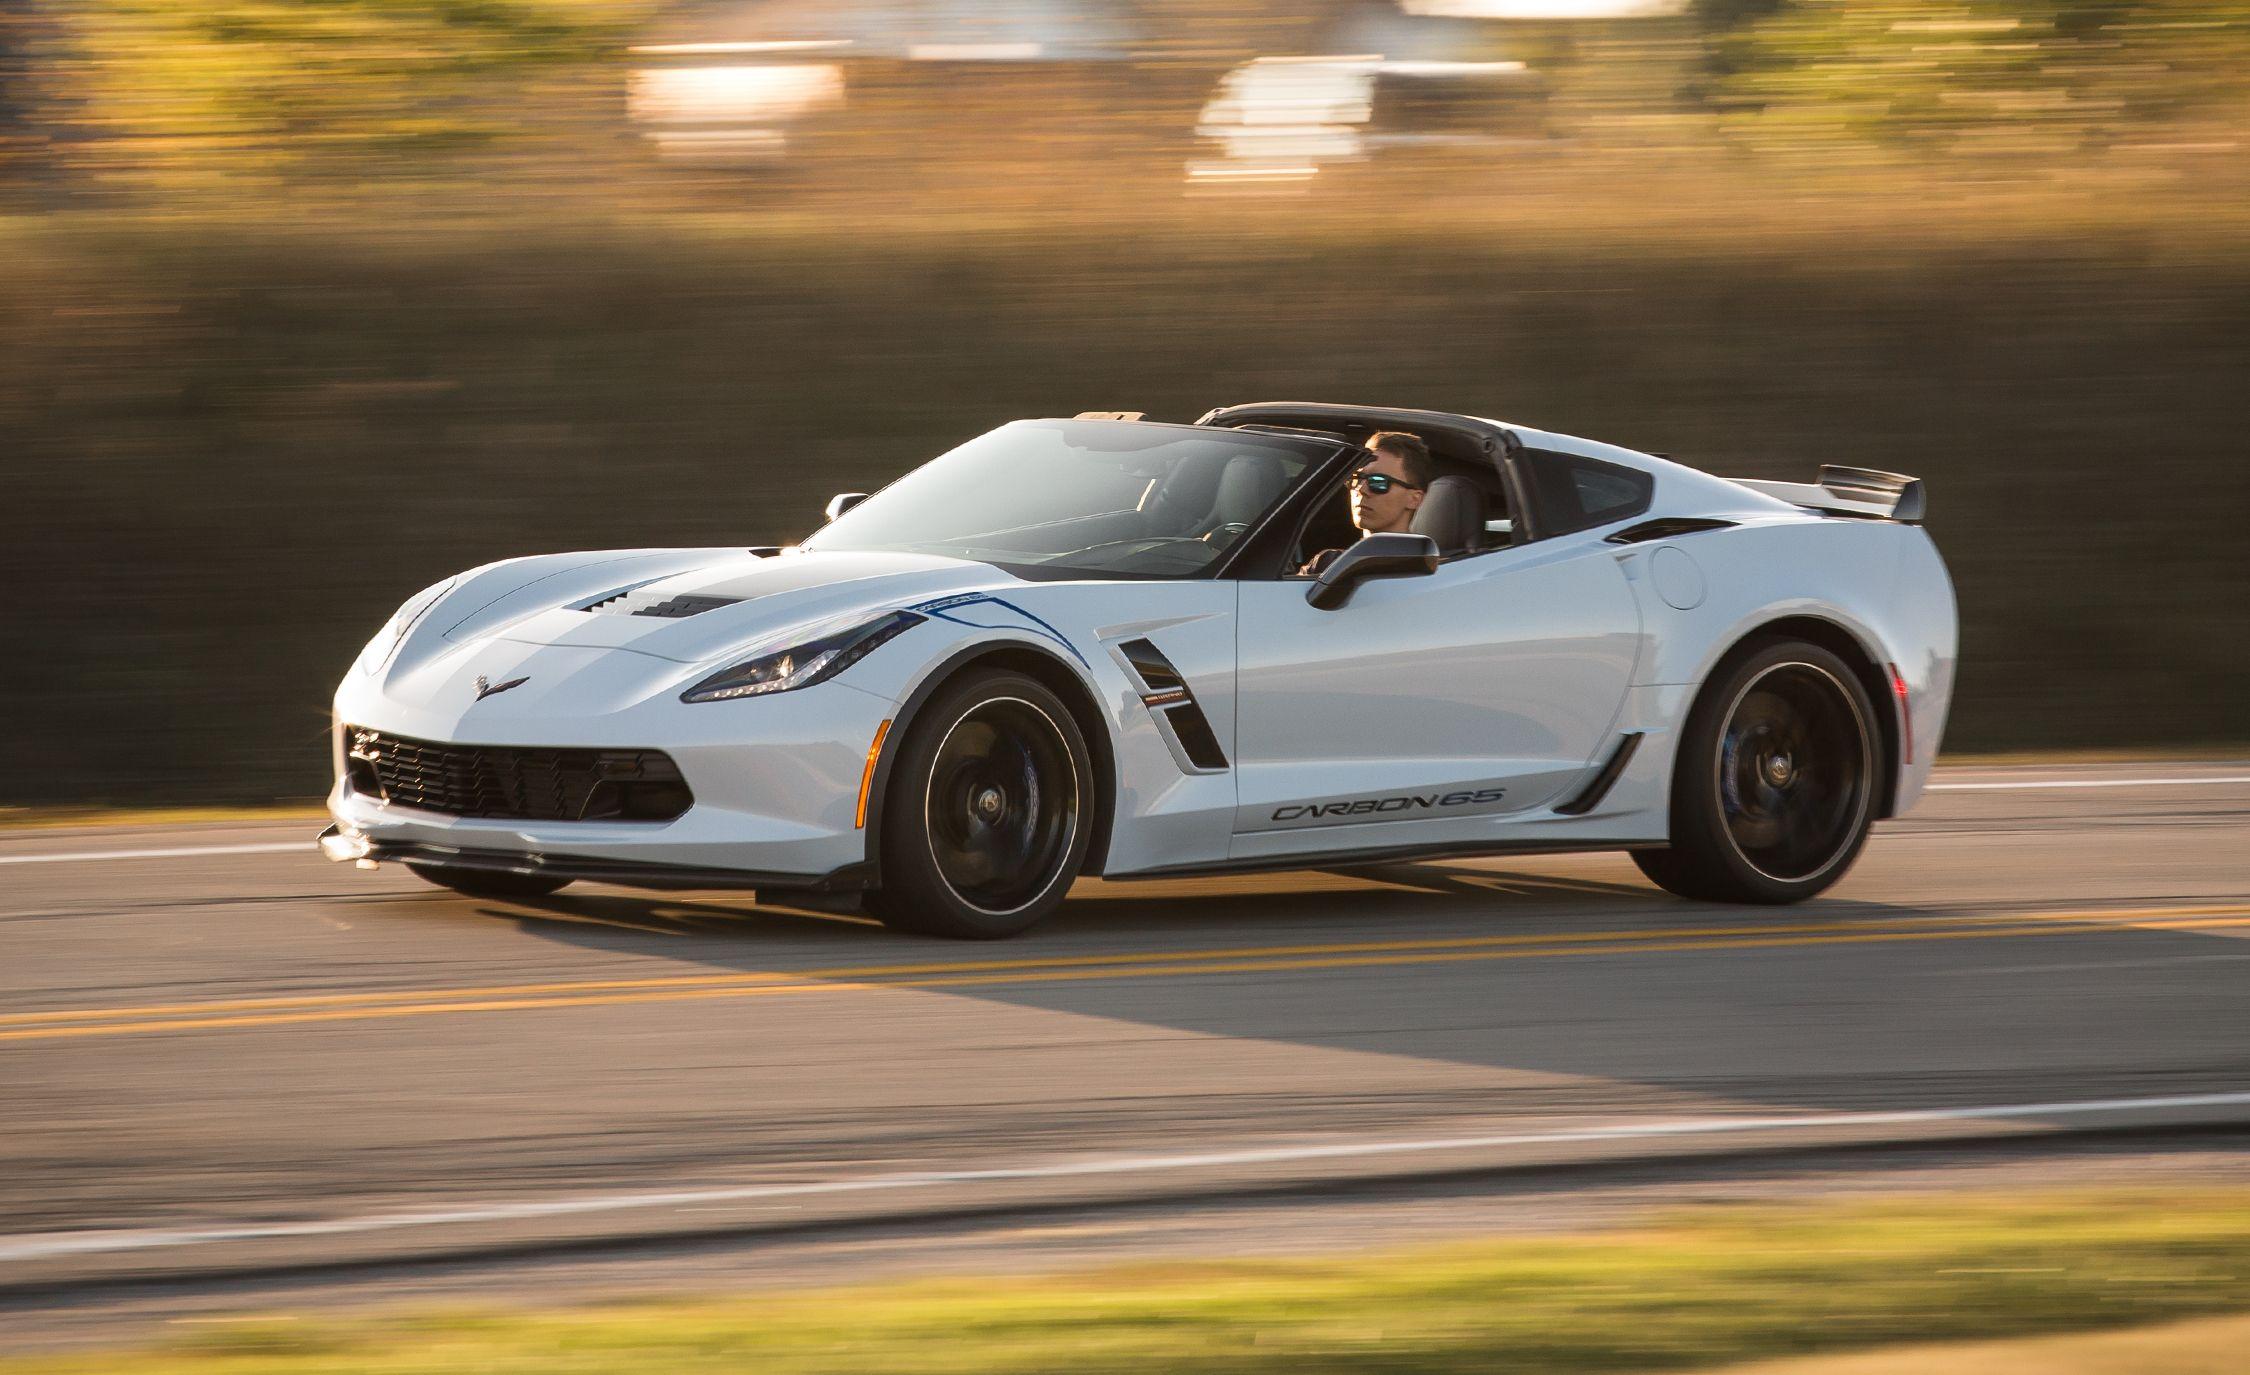 Chevy Corvette 2018 >> 2018 Chevrolet Corvette Grand Sport Review Car And Driver